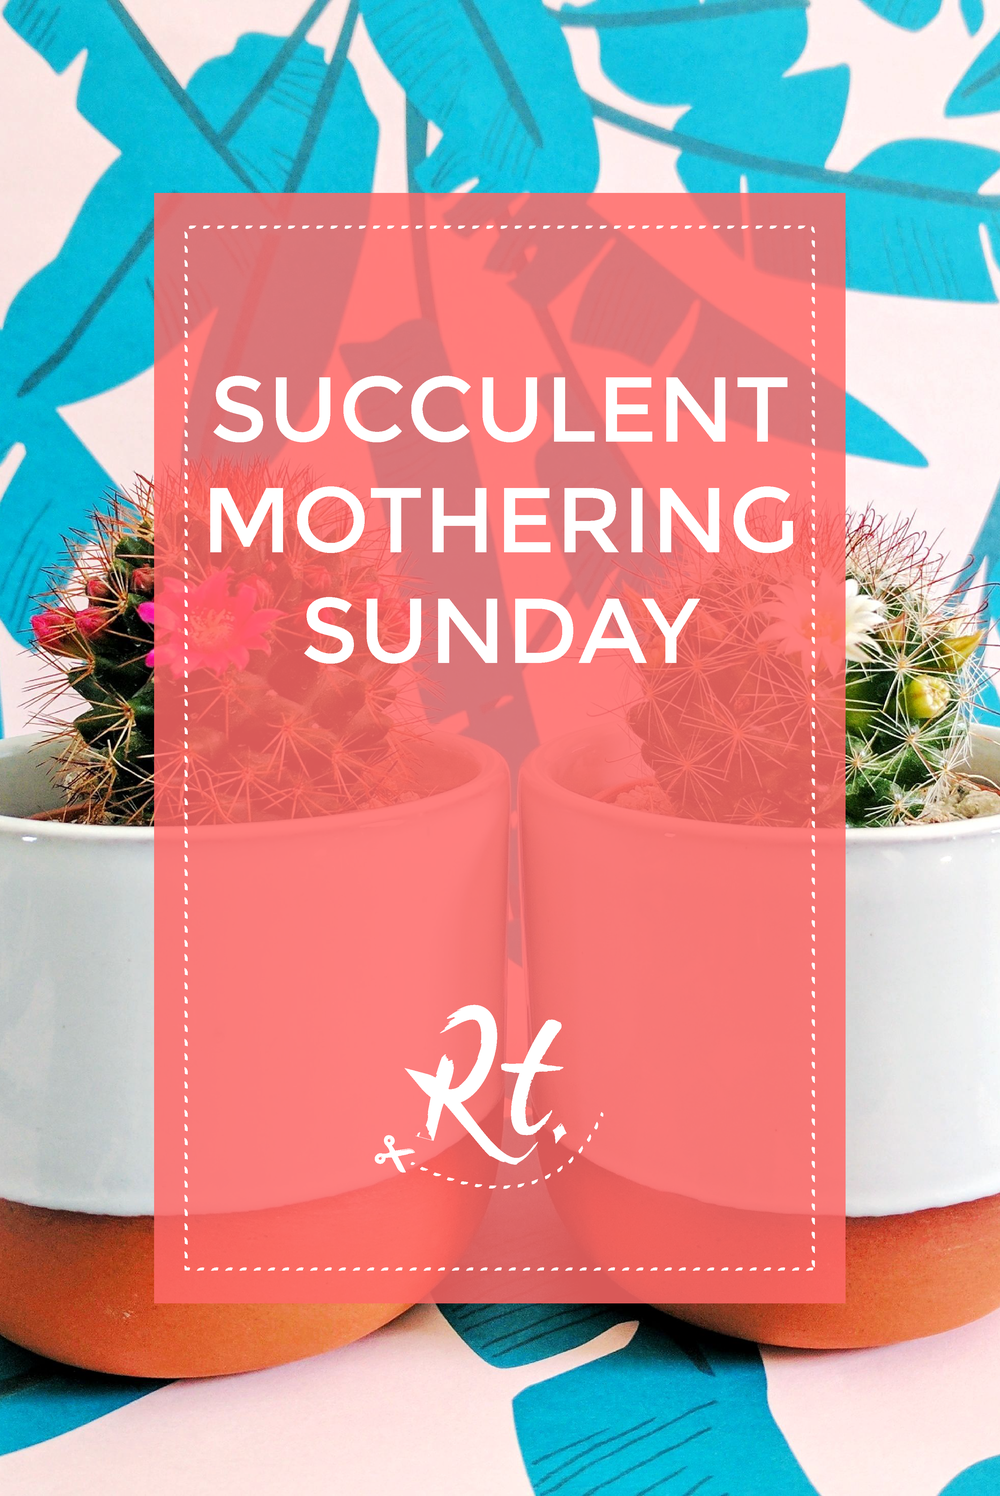 Prick LDN, Succulent Cacti gifts